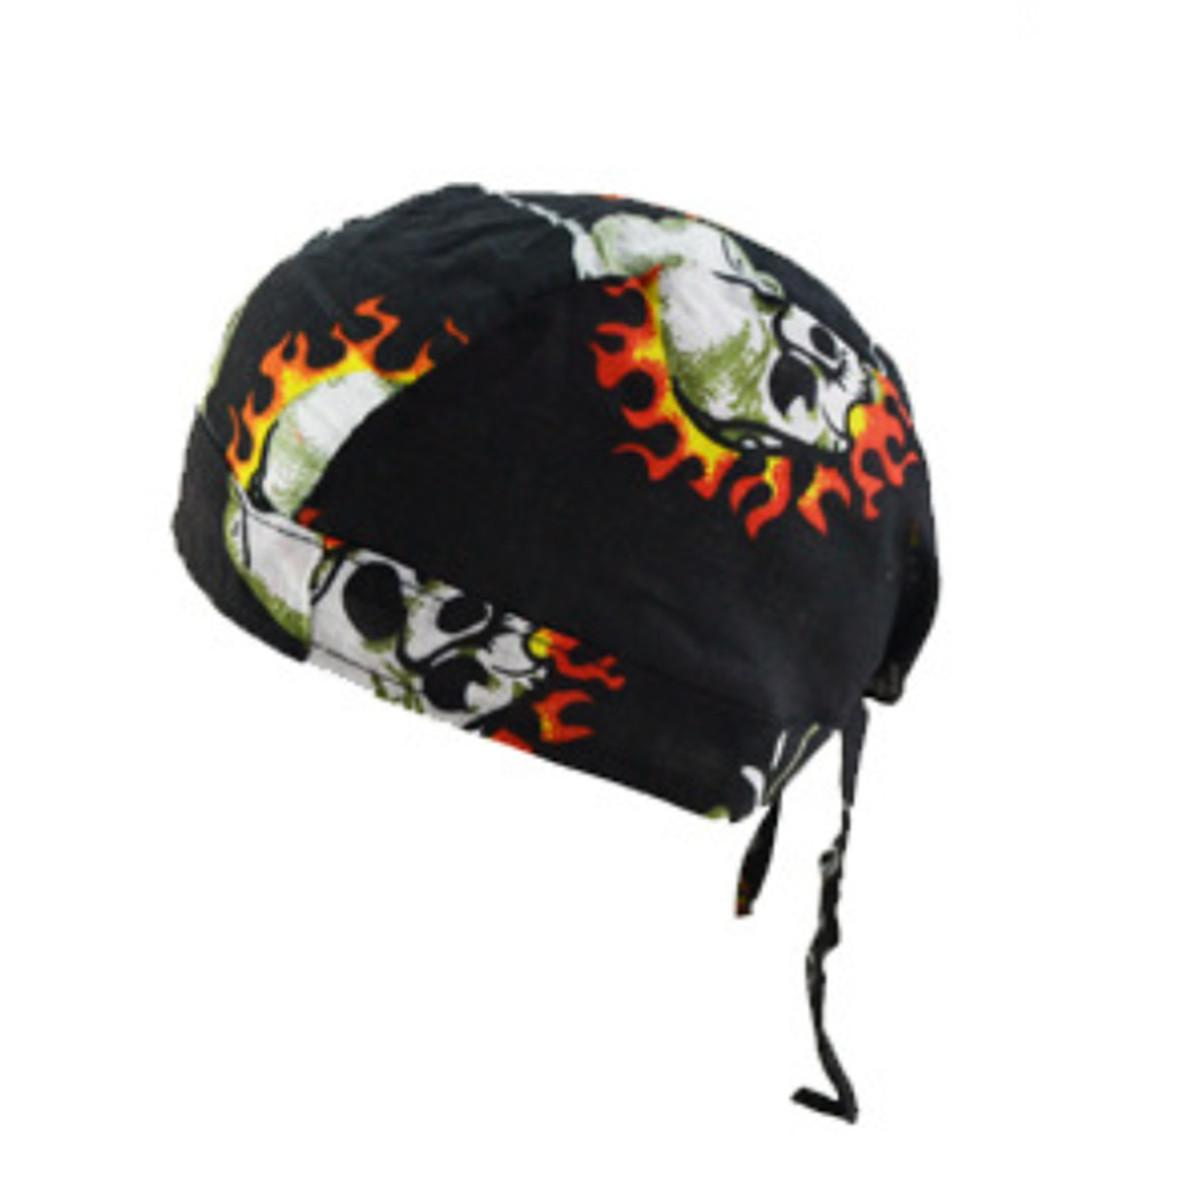 Cotton Biker Skull Cap Motorcycle Bandana Head Wrap Du Doo Do Rag Black Hat New